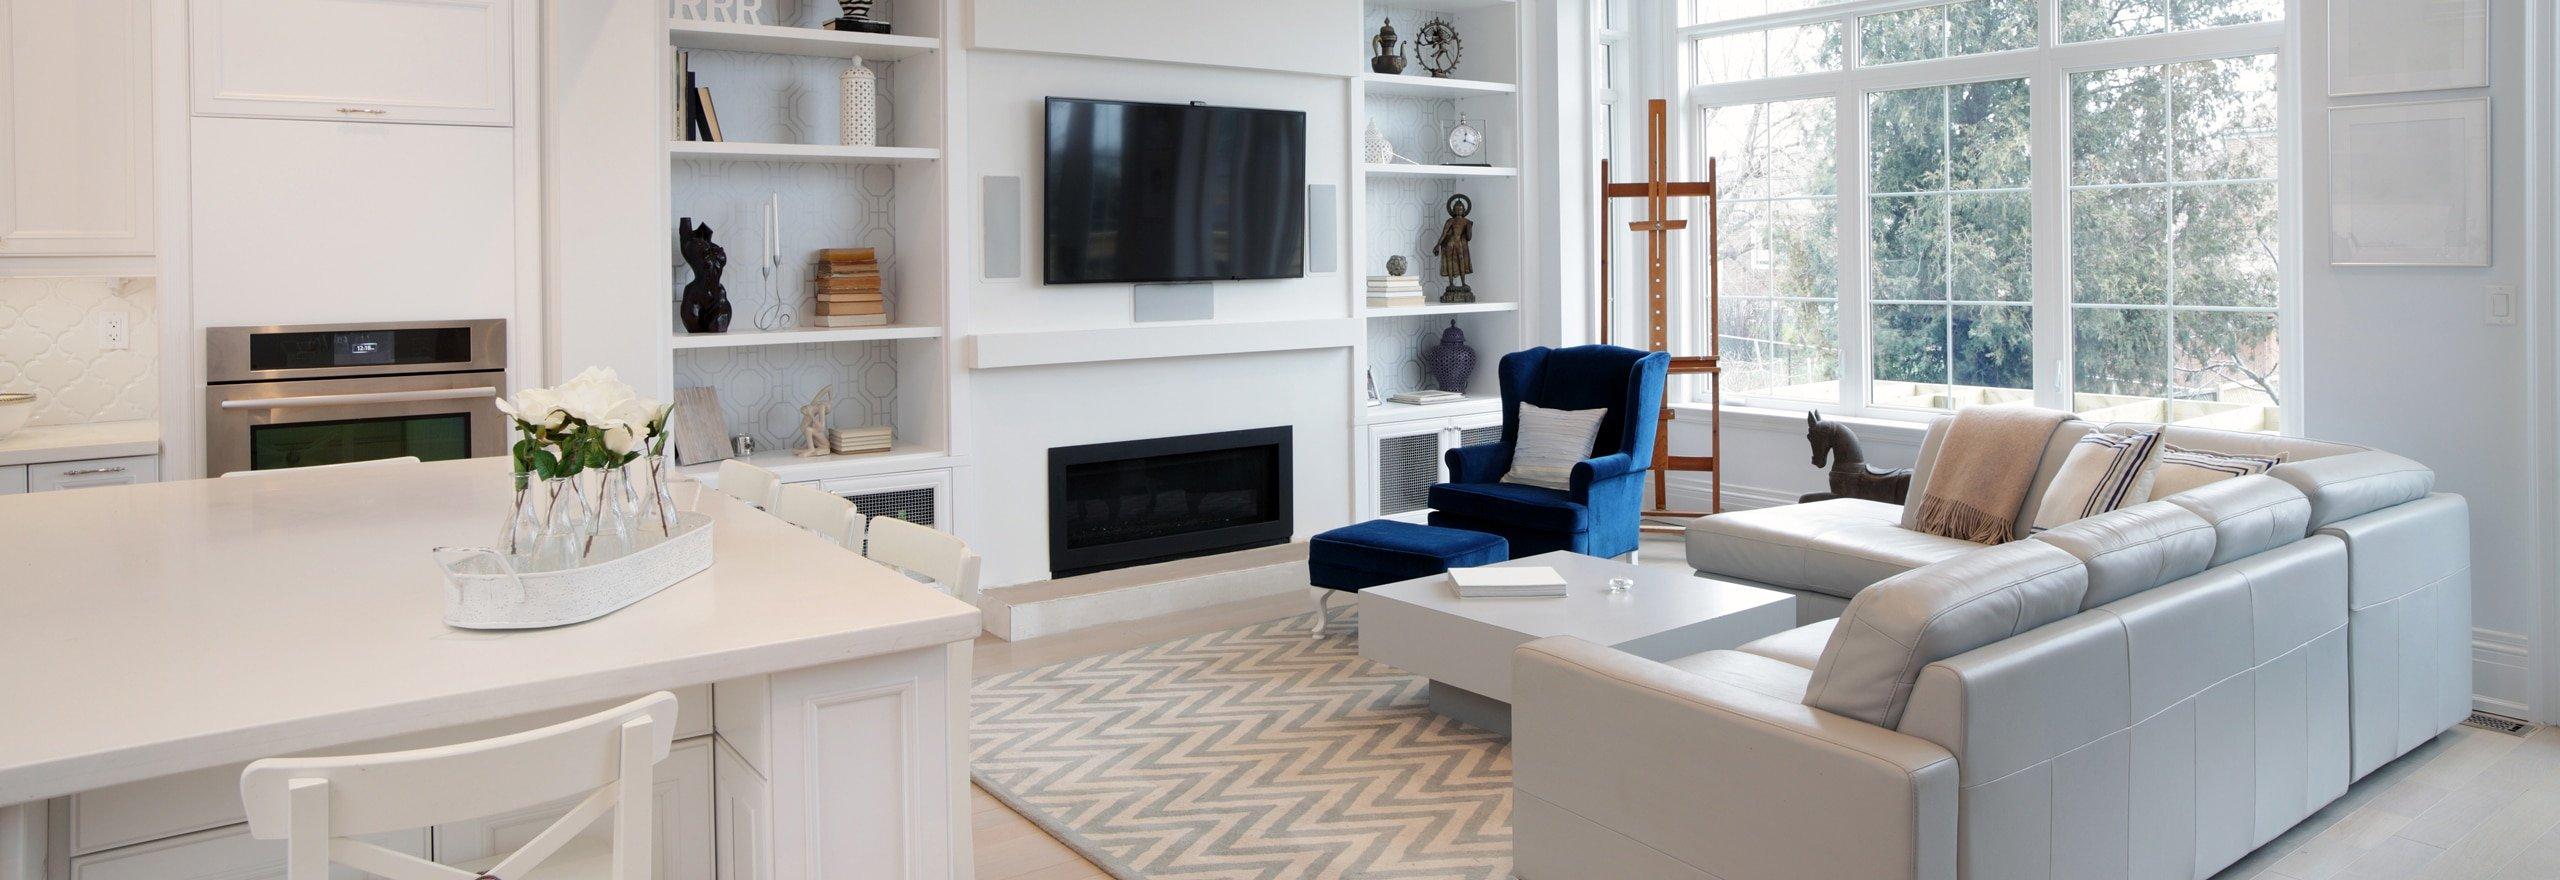 Interior design removals in London width=